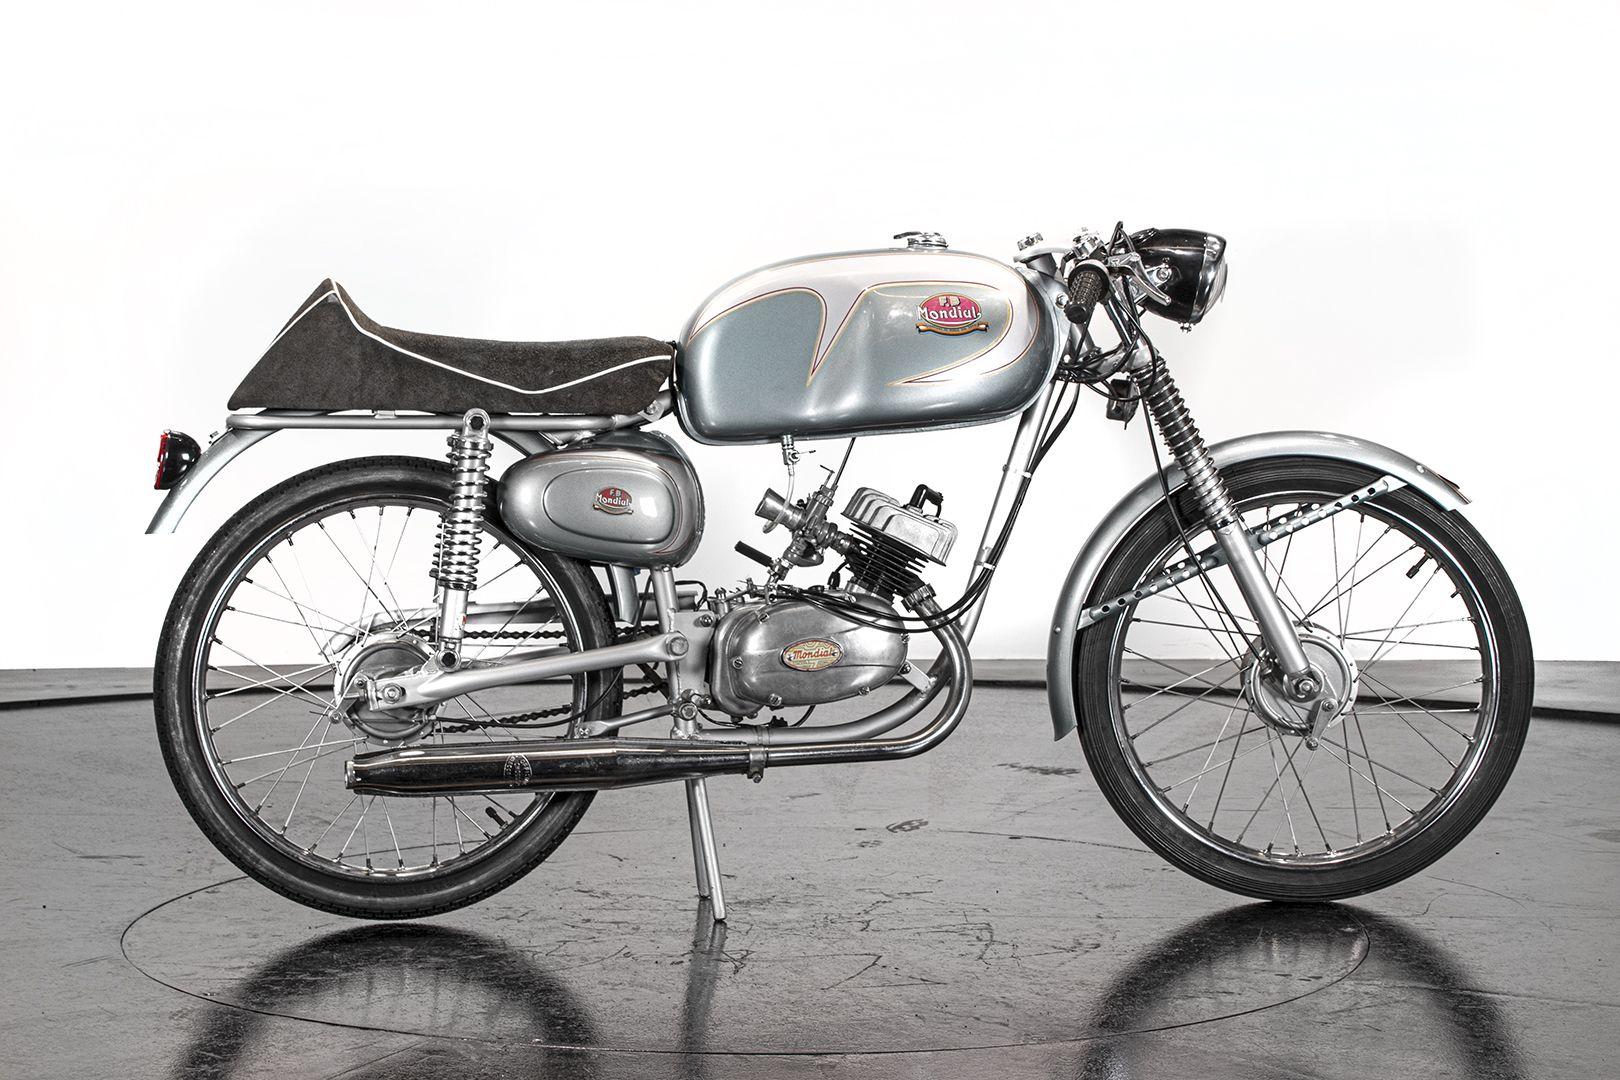 1972 Mondial Nova 61349